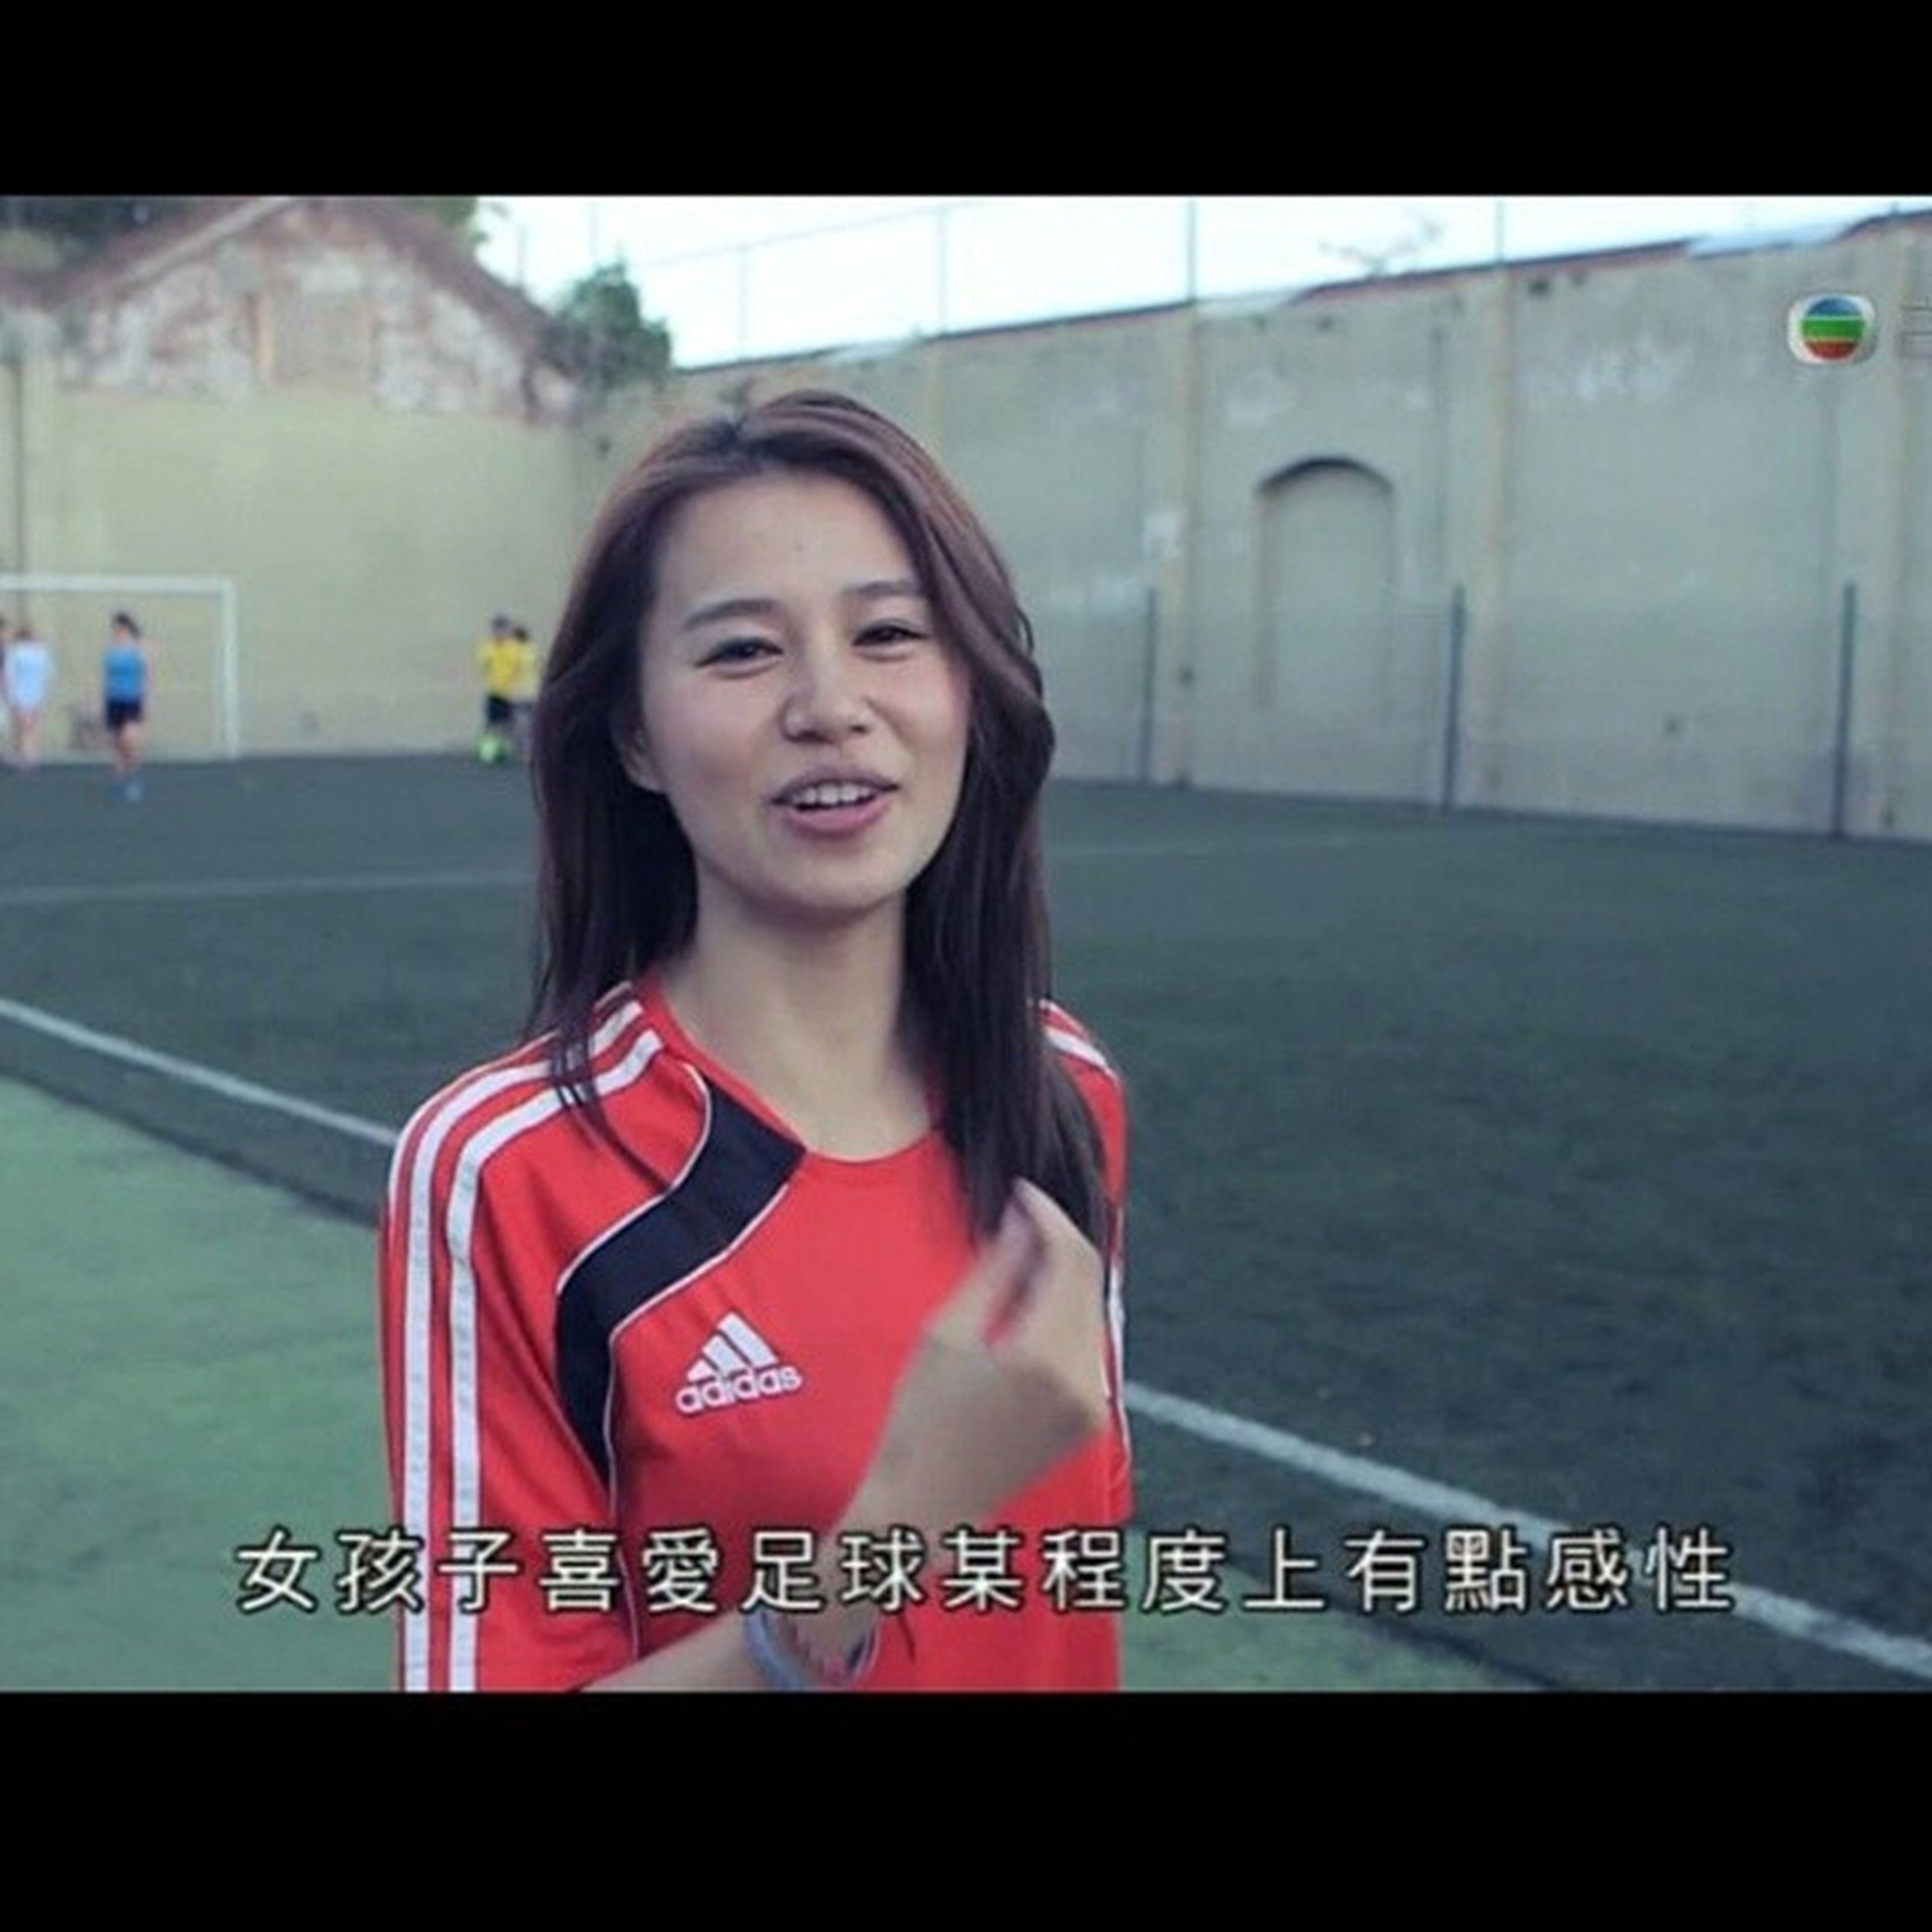 Will my beloved also a football lover? Hkig 2014 Football 走過足球聖地 黃翠如 @wongtsuiyu